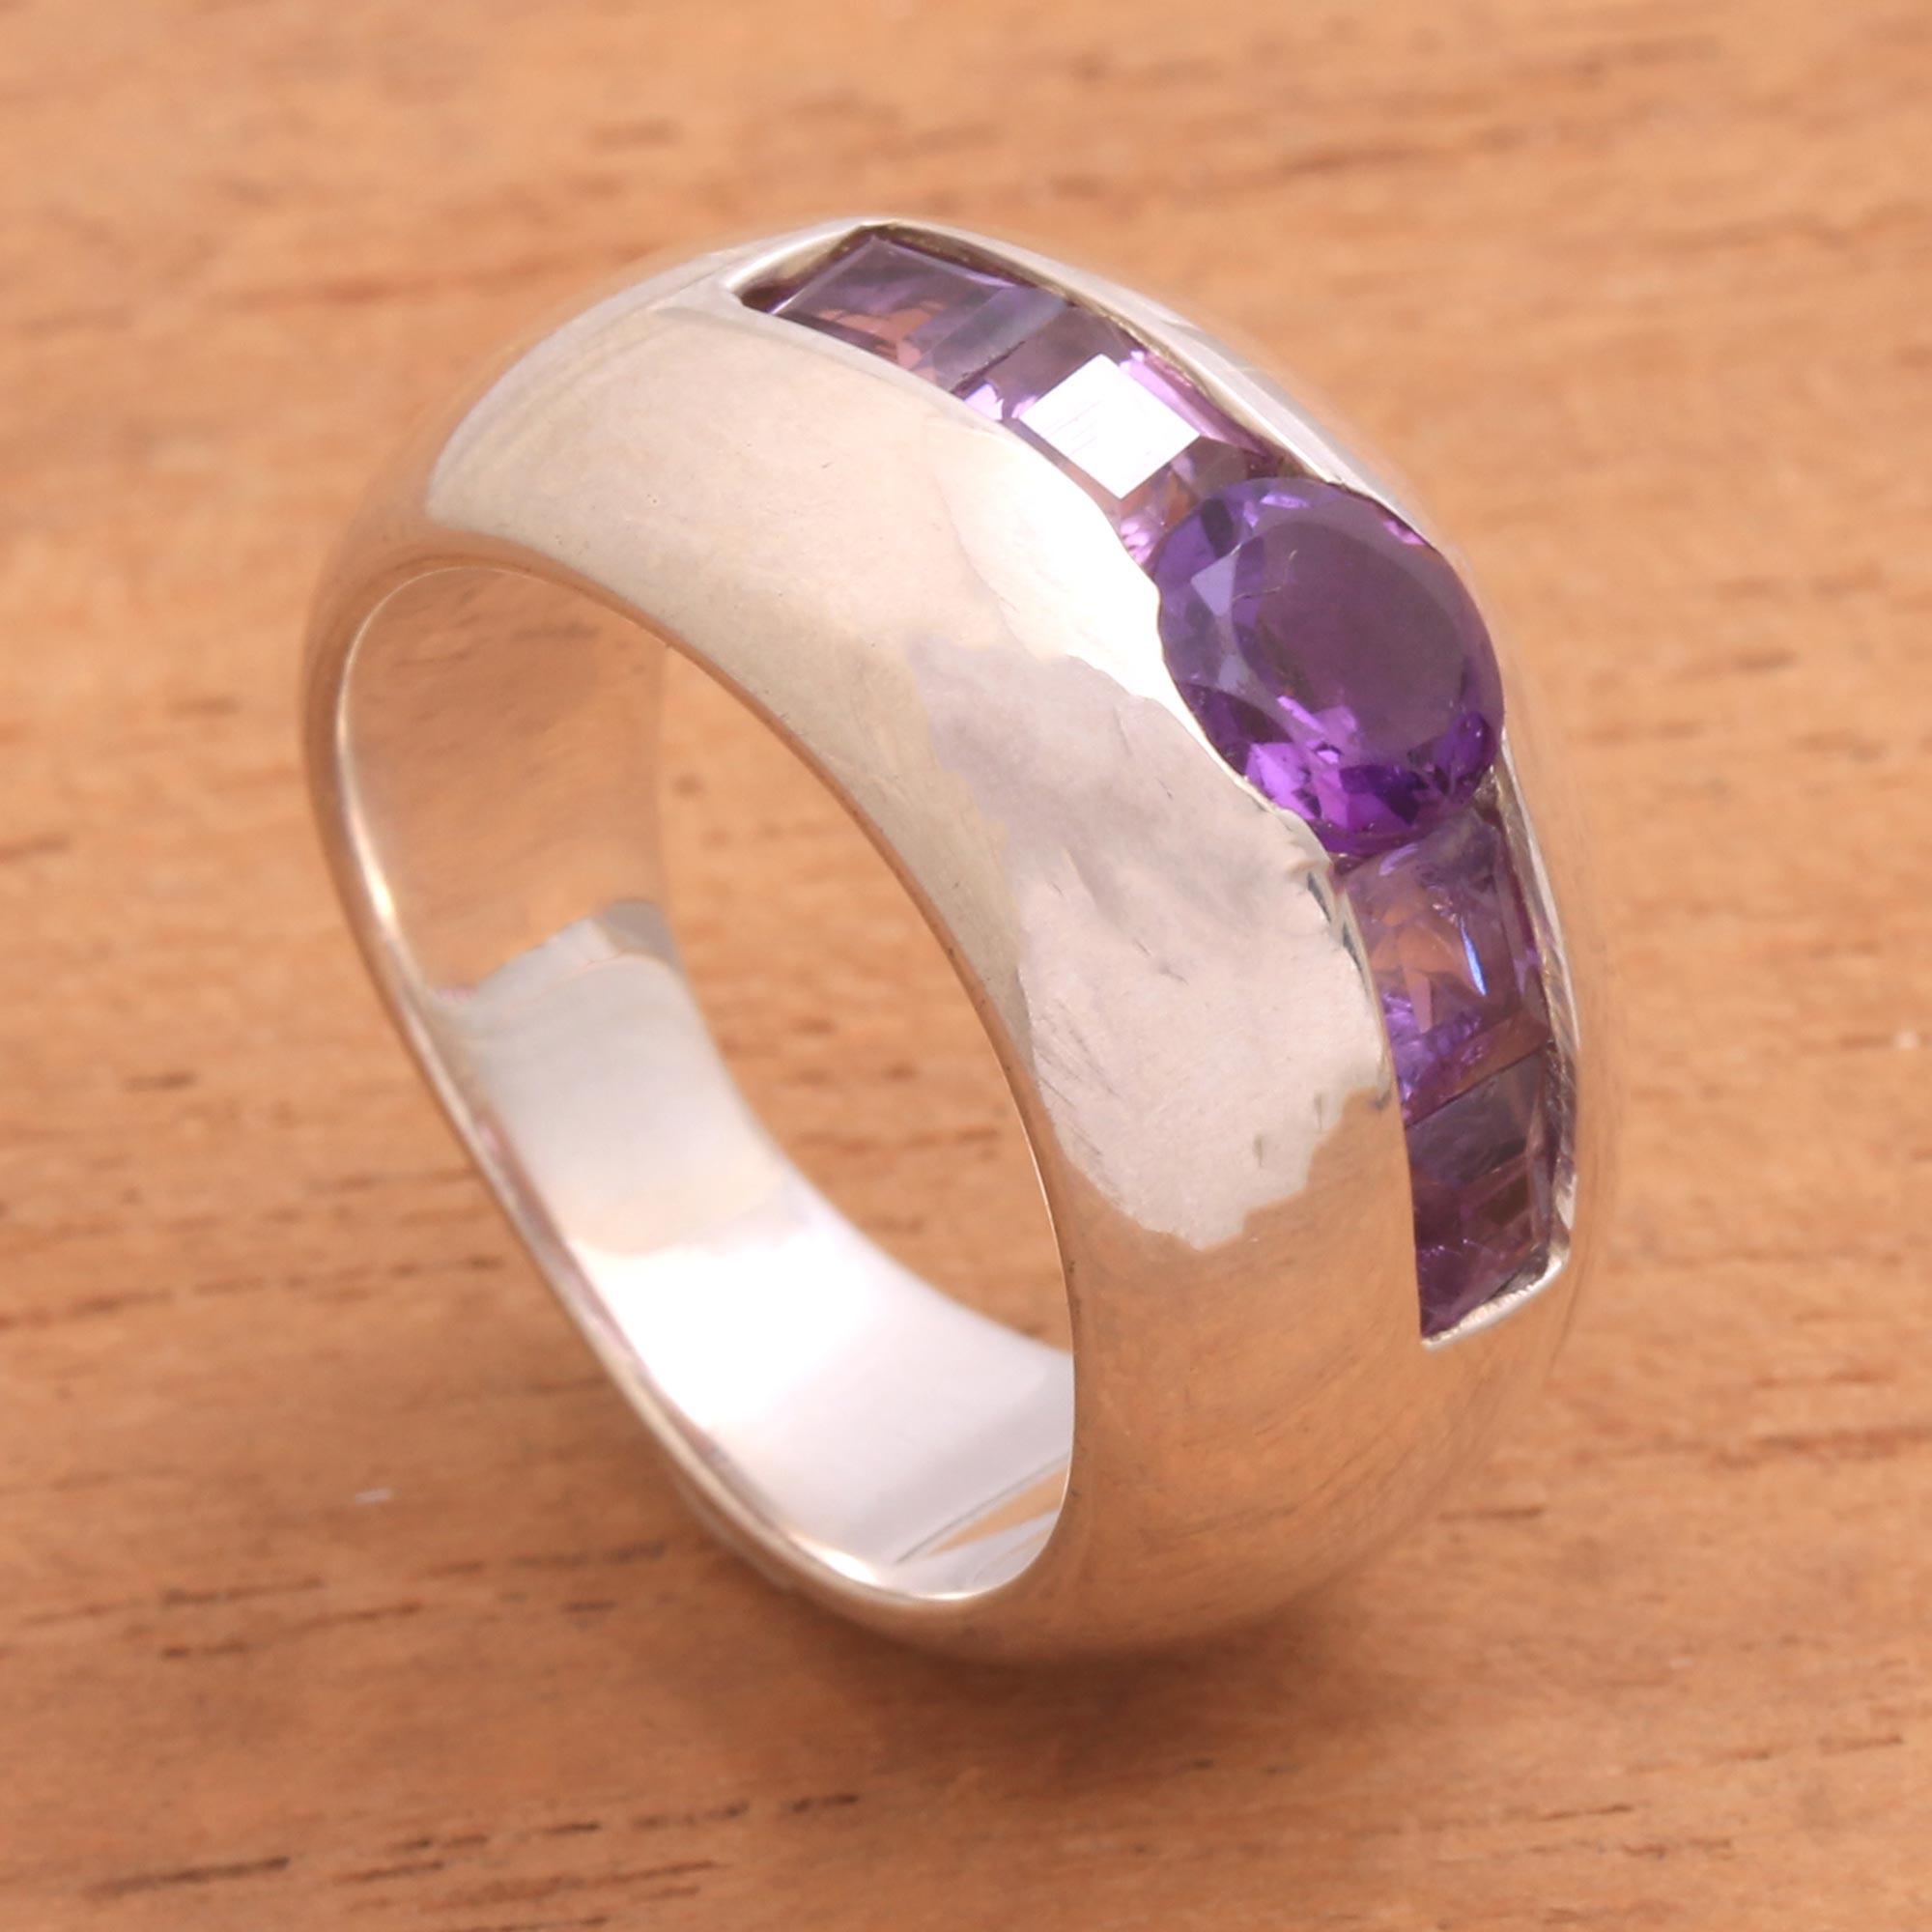 Chic minimalist amethyst ring